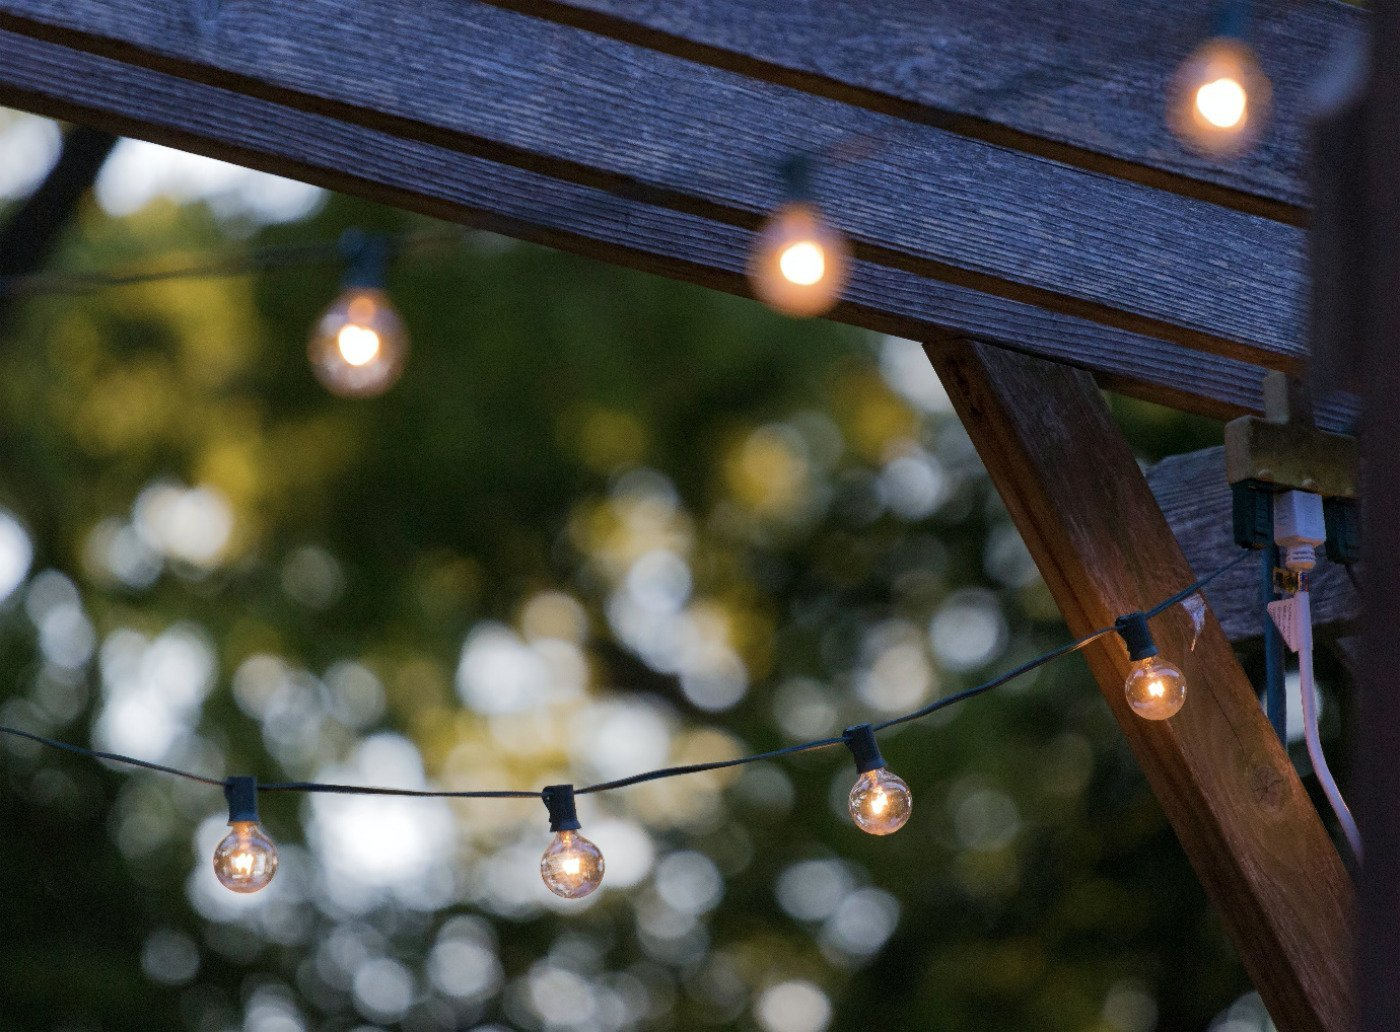 Romantic Ambient Lighting